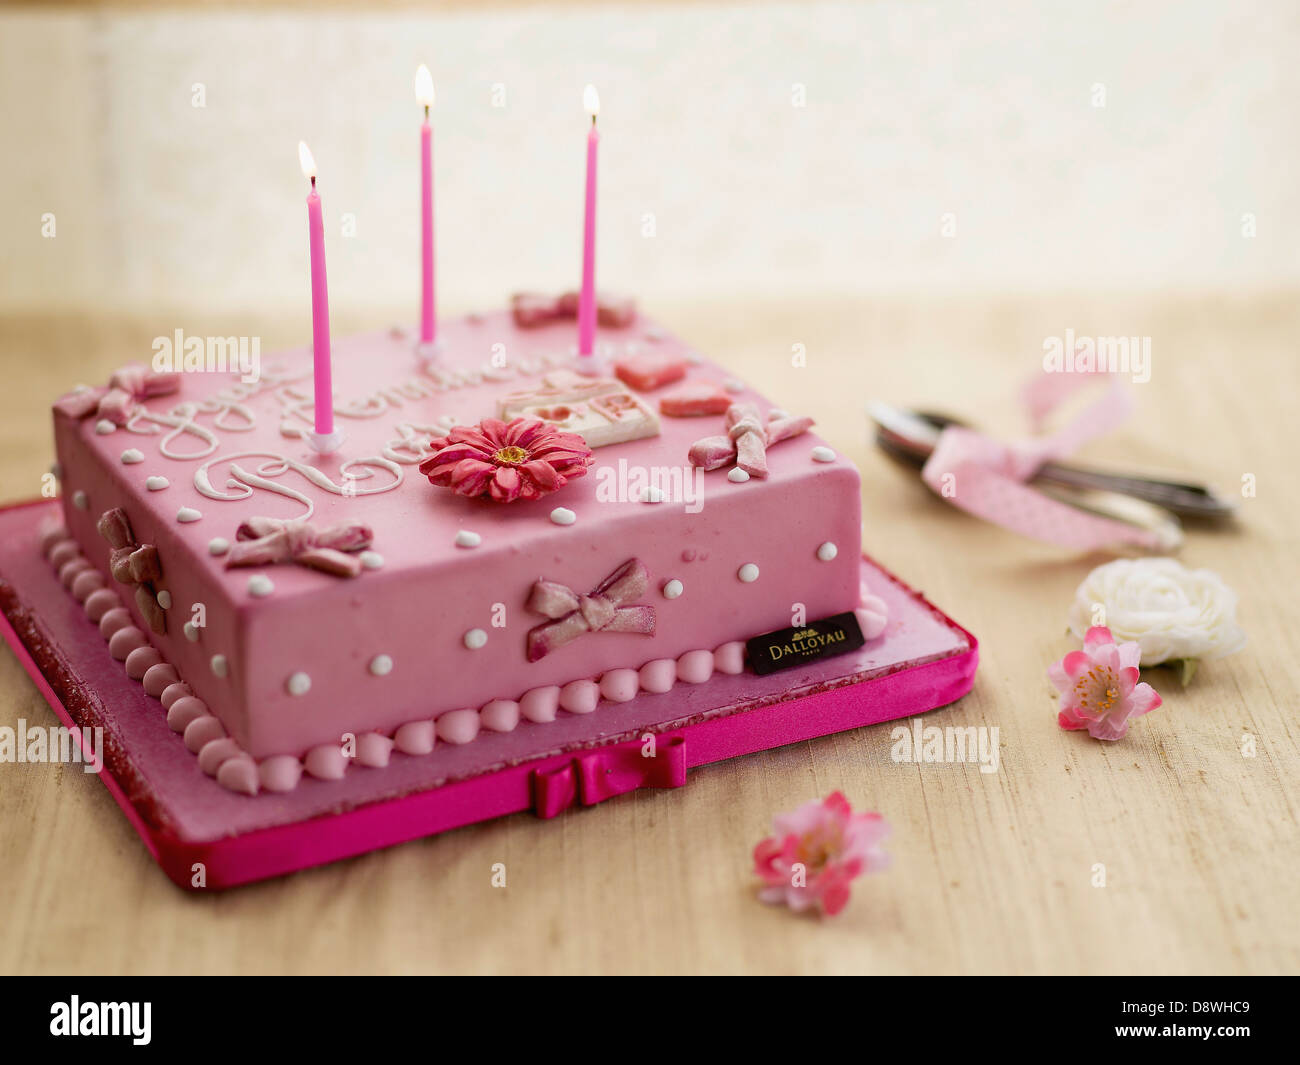 Birthday Cake With Almond Paste Decorations Dalloyau Creation Stock